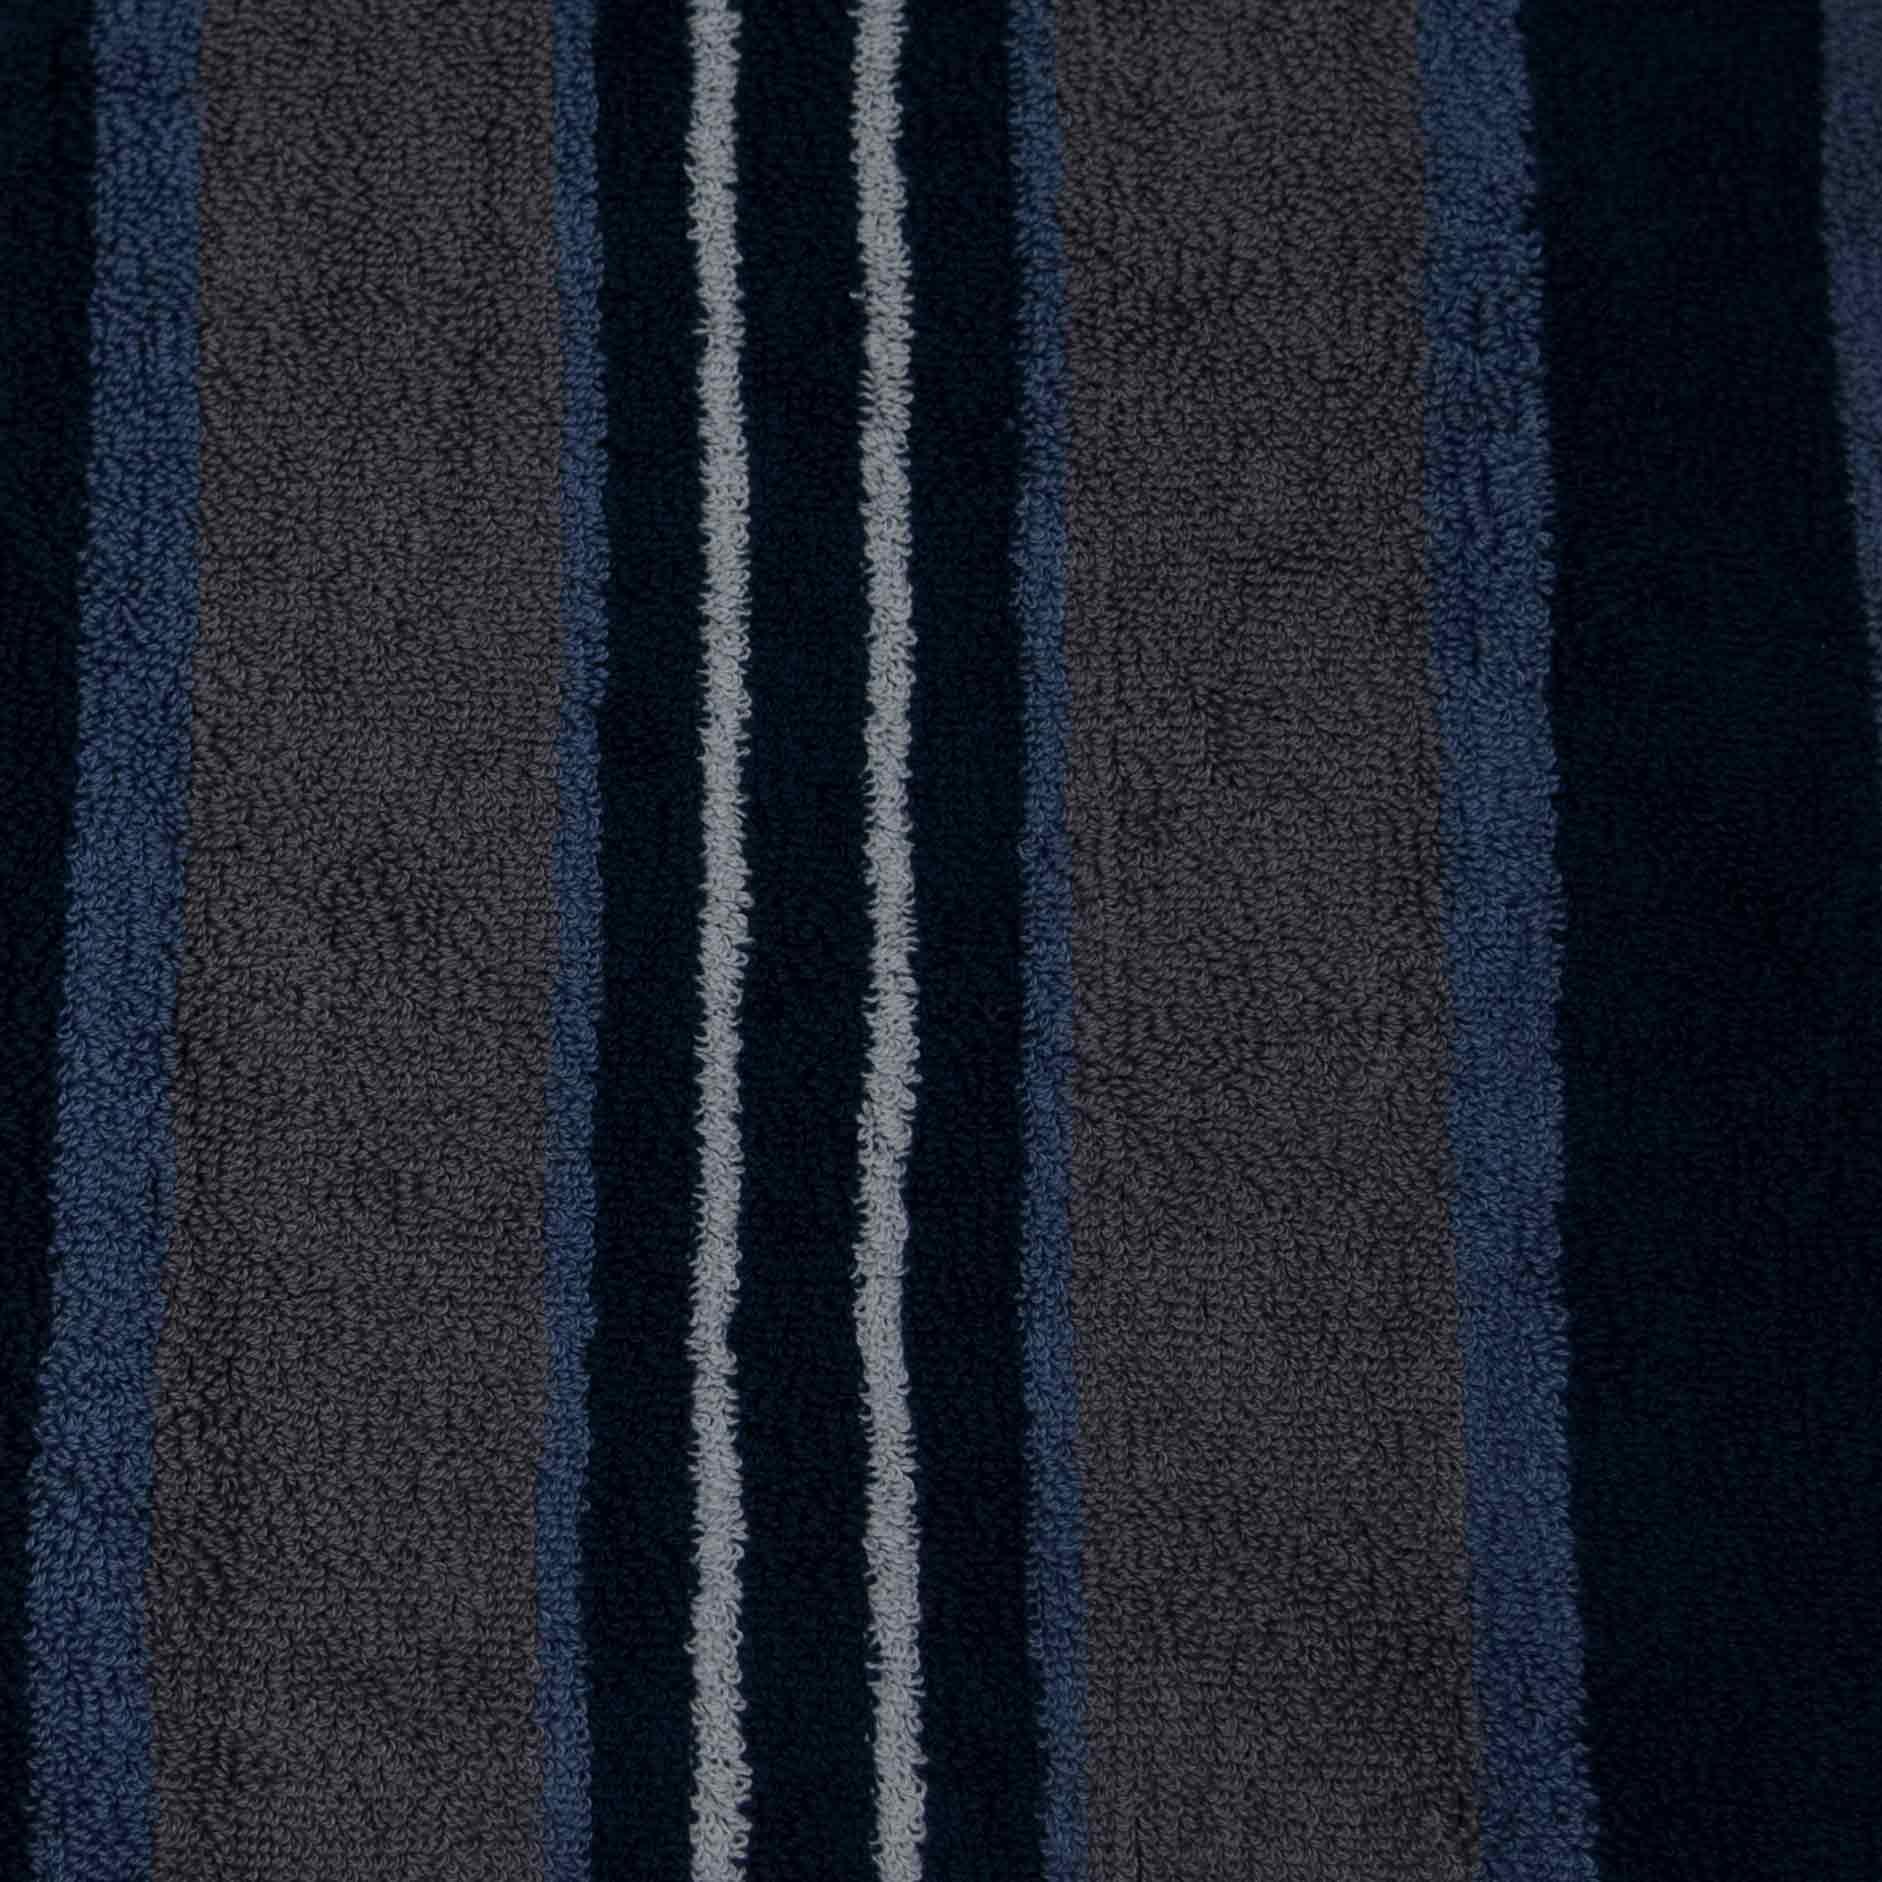 Inexpensive Linens